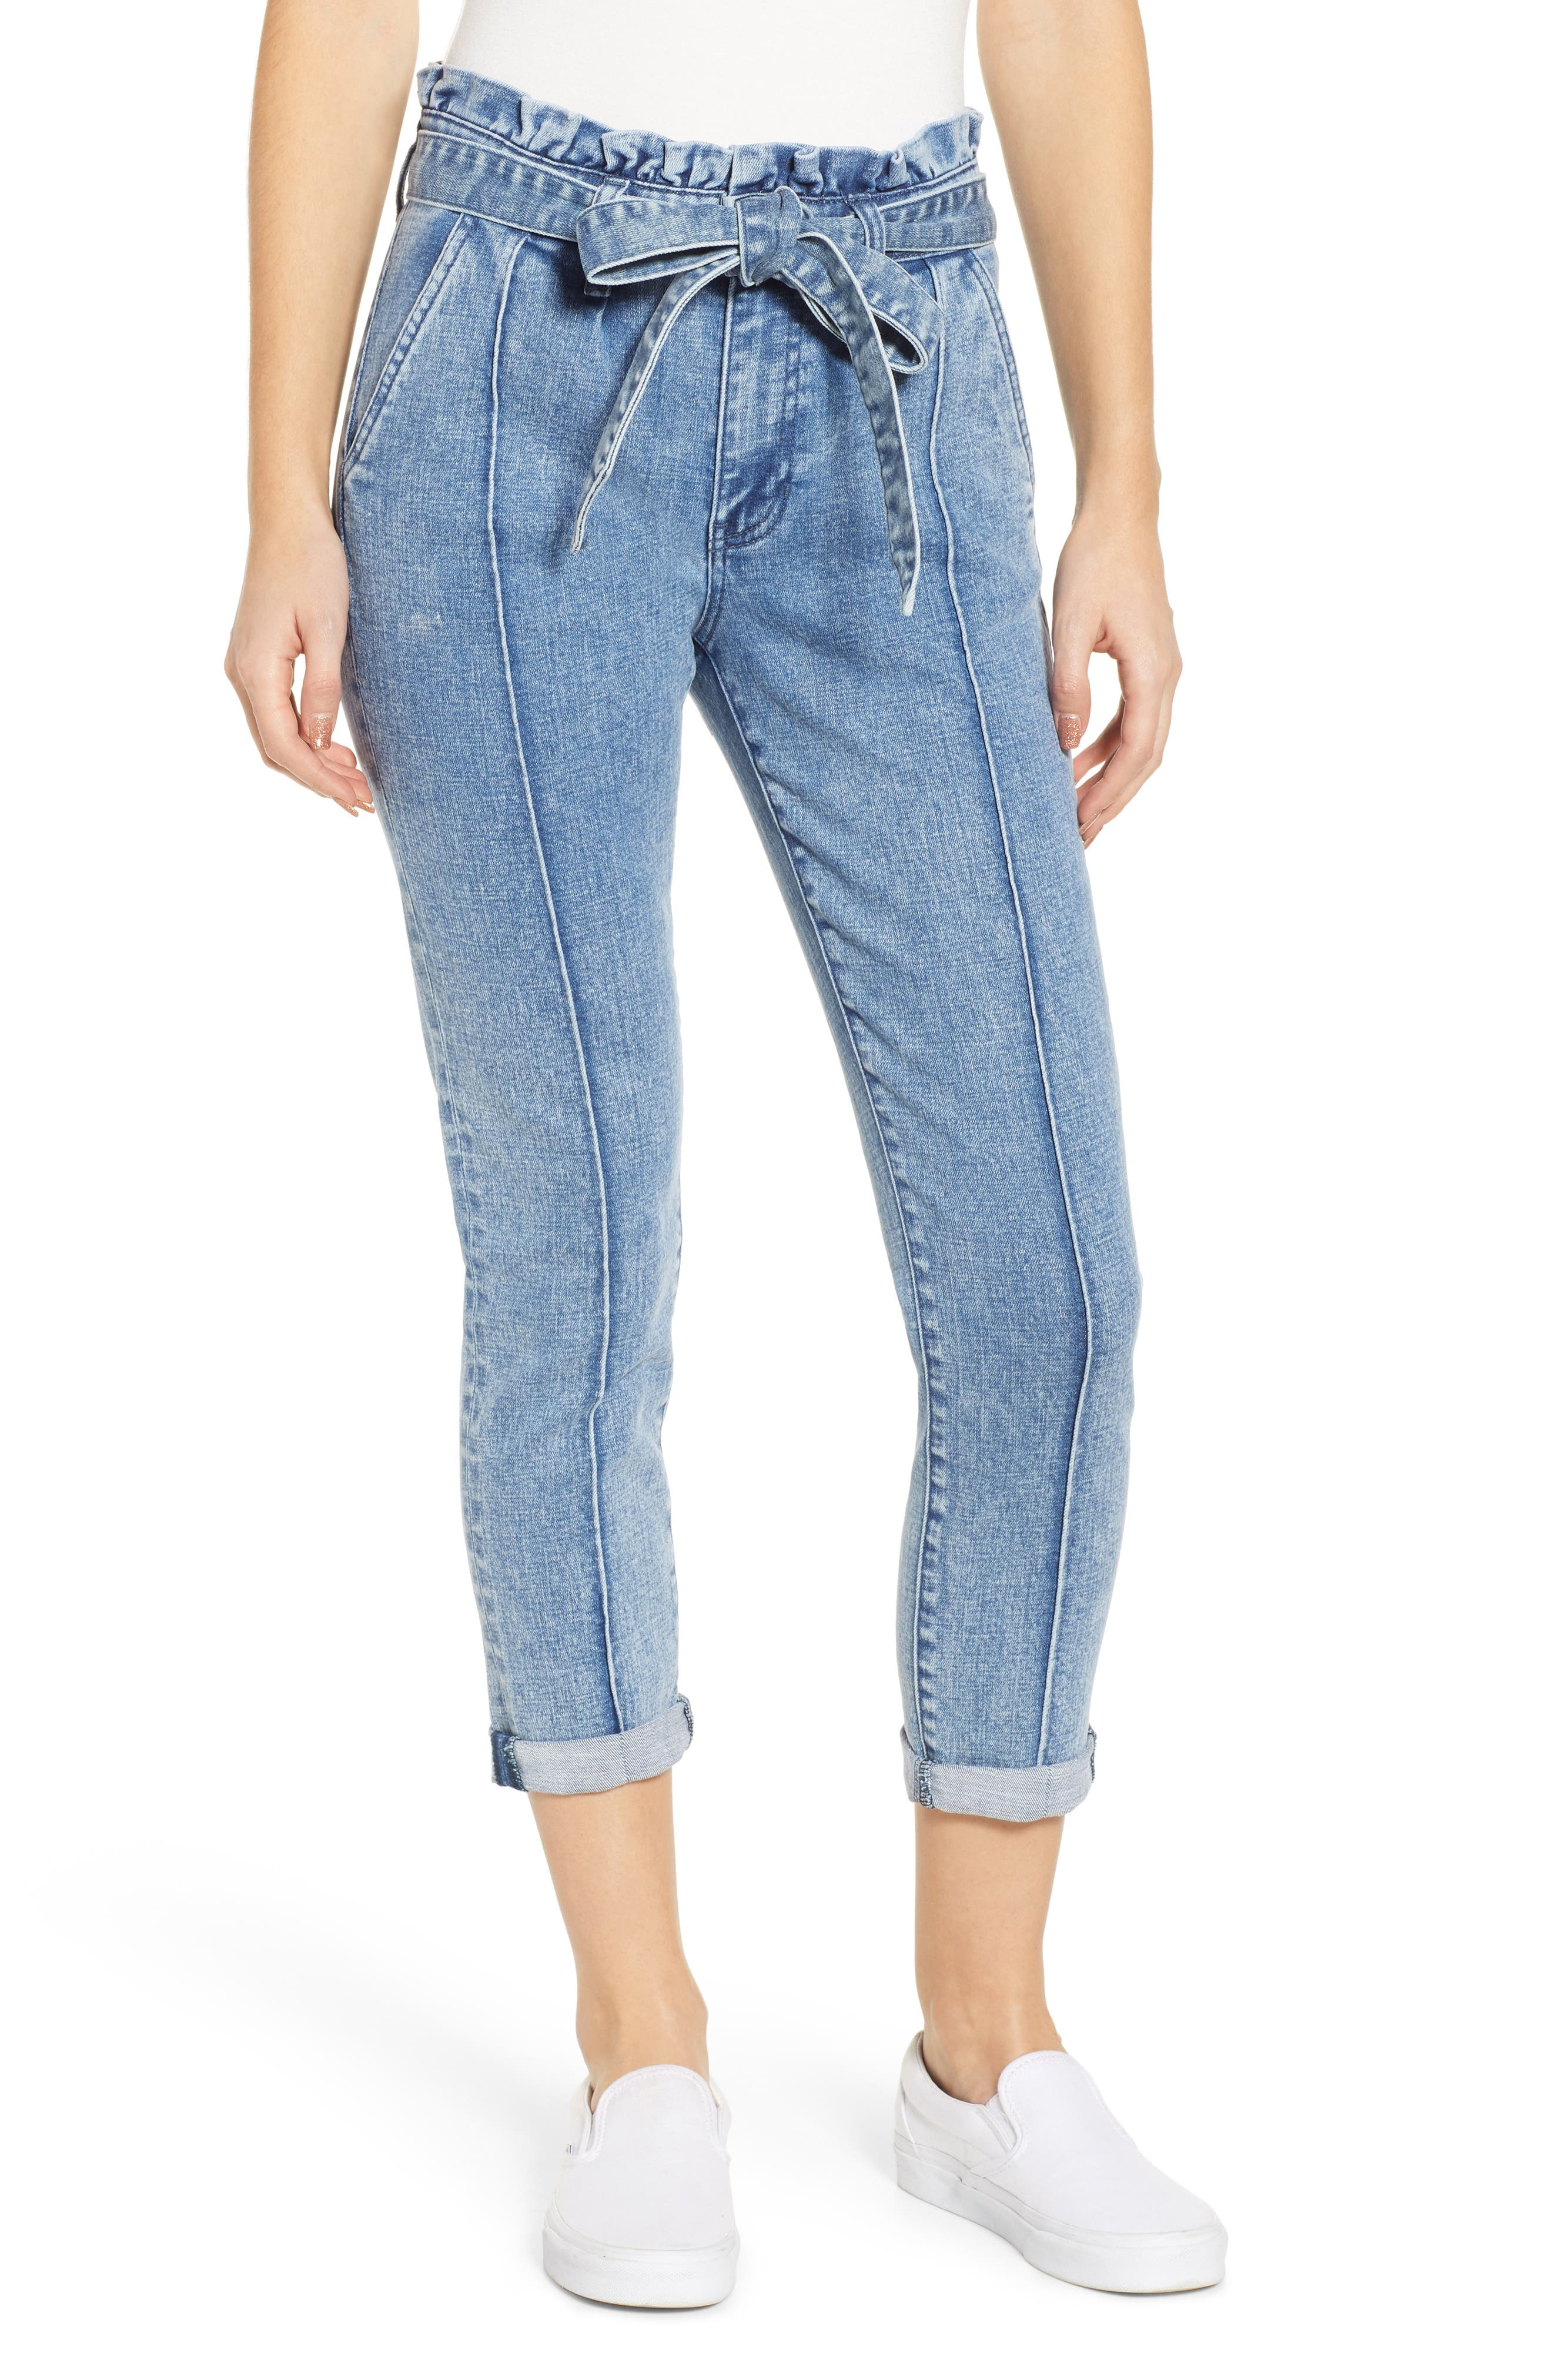 PROSPERITY DENIM, Paperbag Waist Crop Skinny Jeans, Main thumbnail 1, color, MEDIUM LIGHT WASH